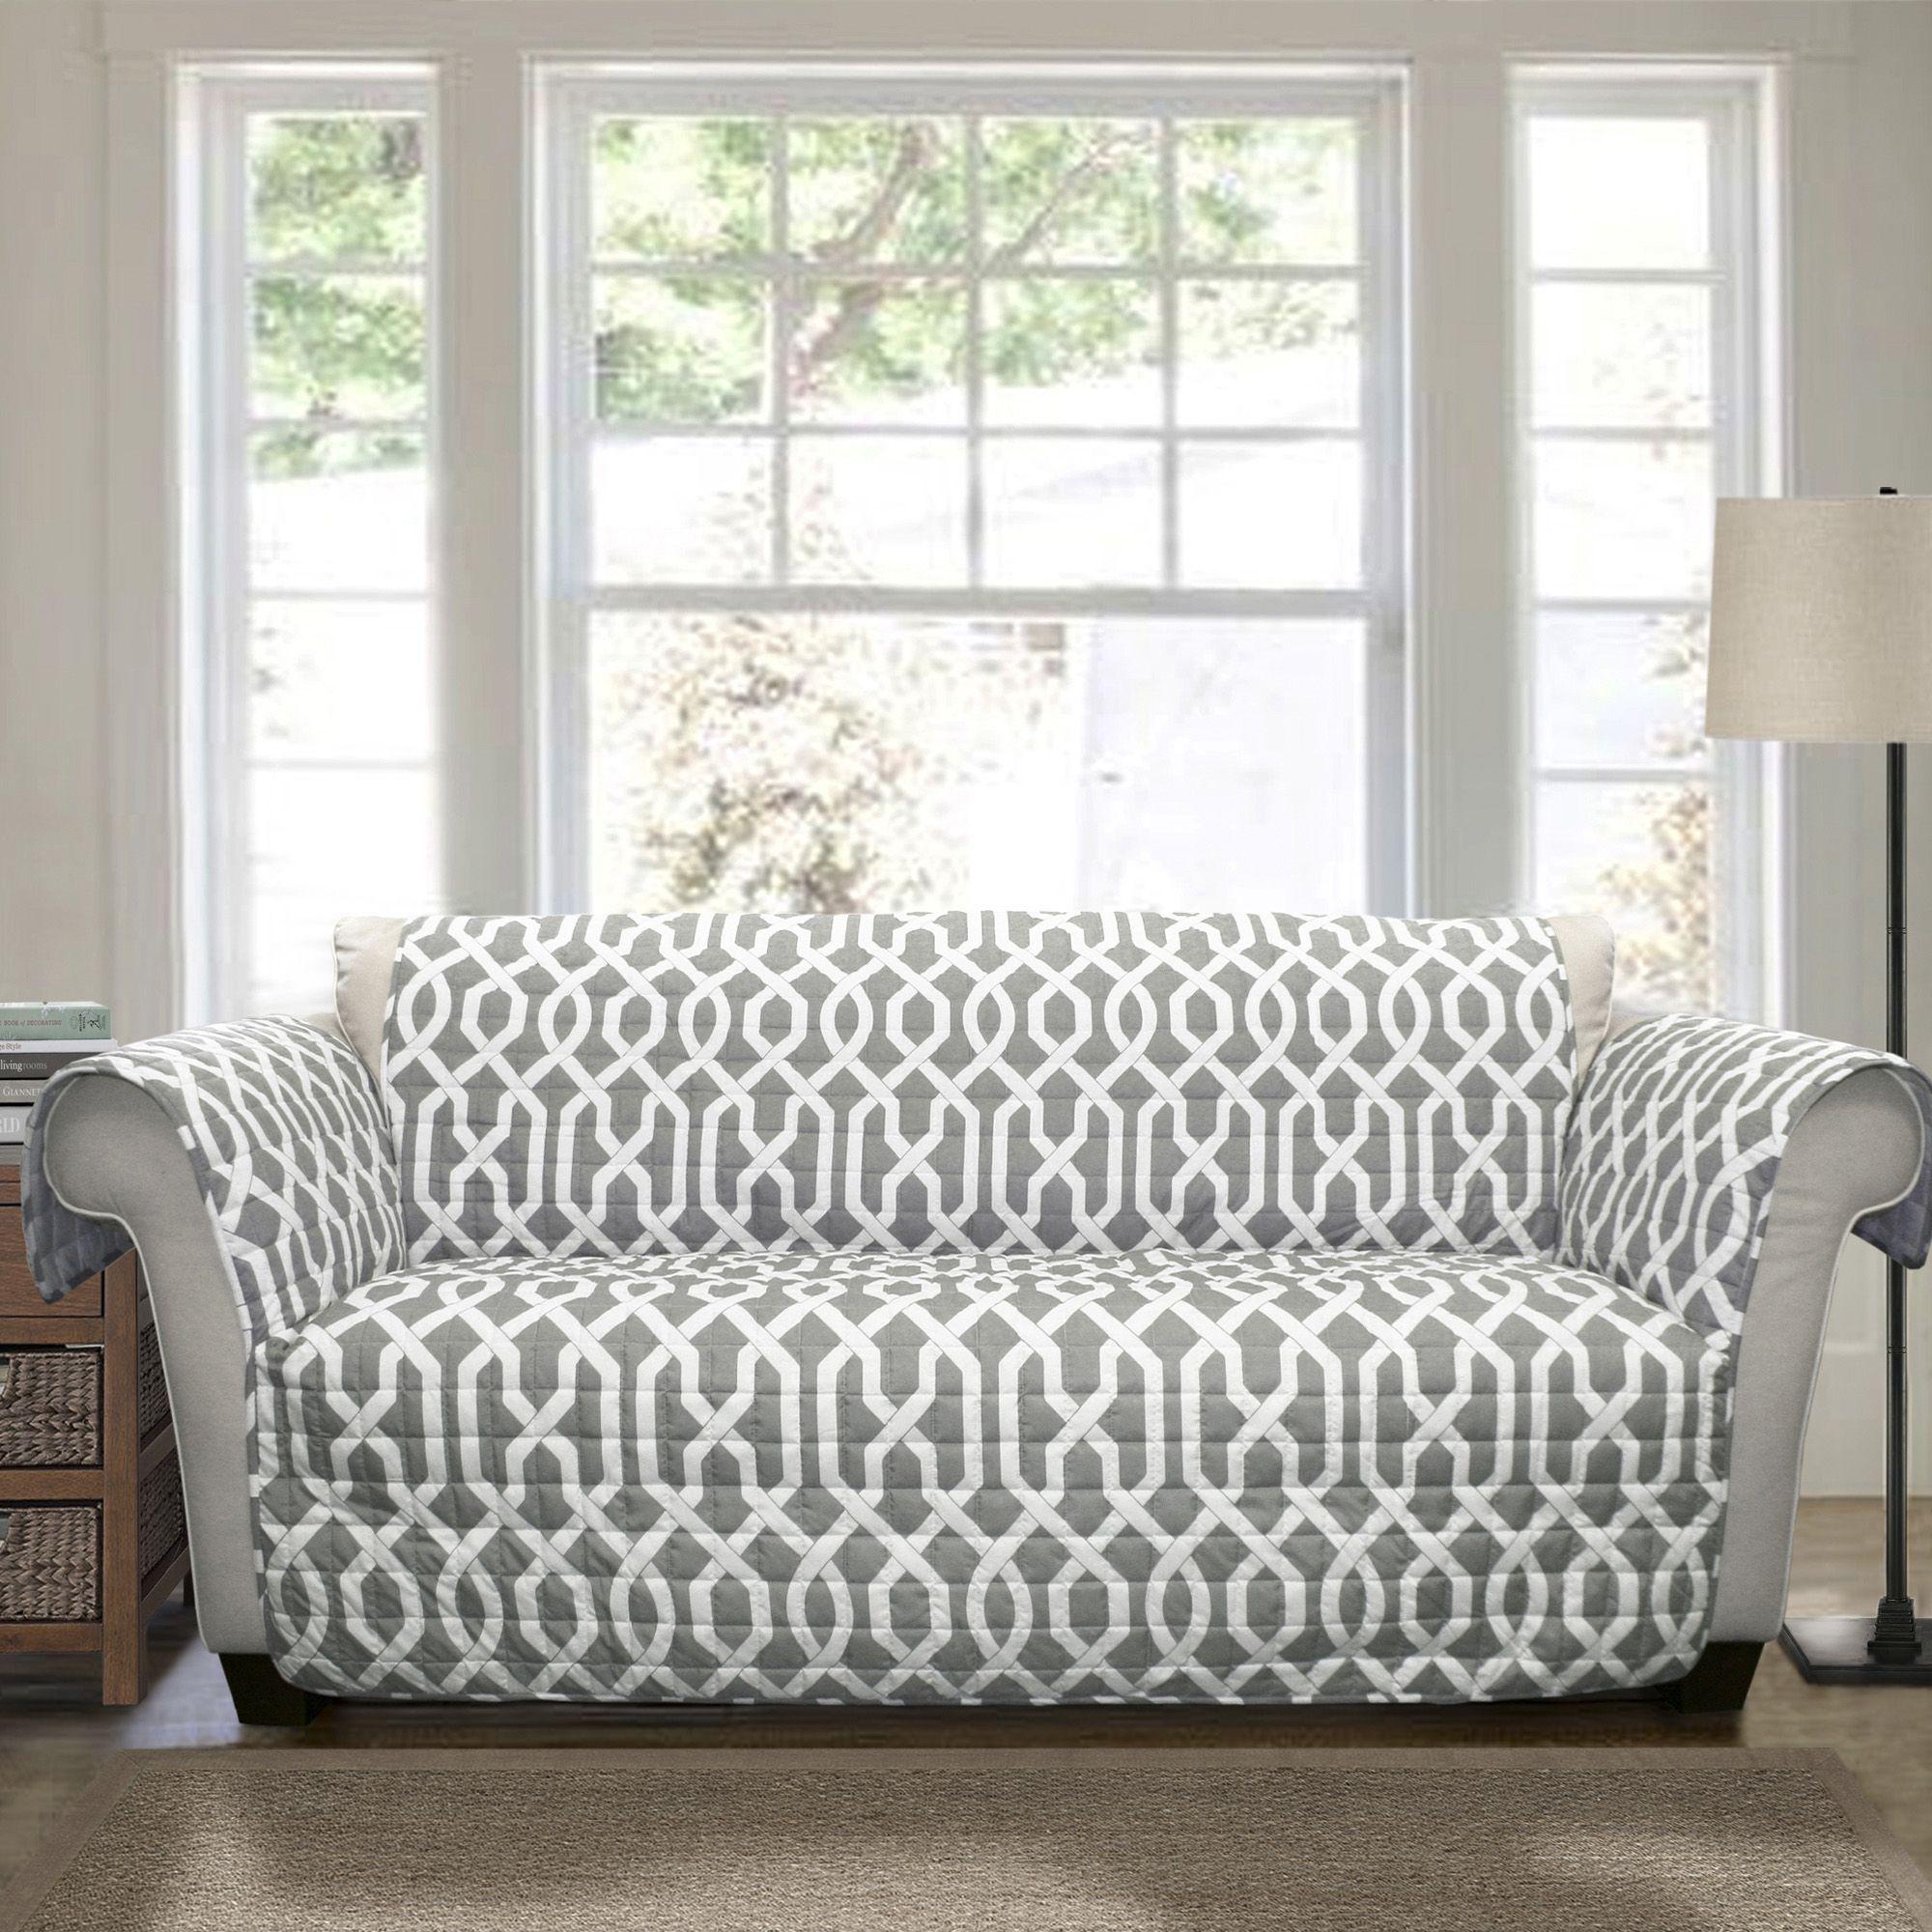 Fingerhut lush decor edward trellis sofa protector